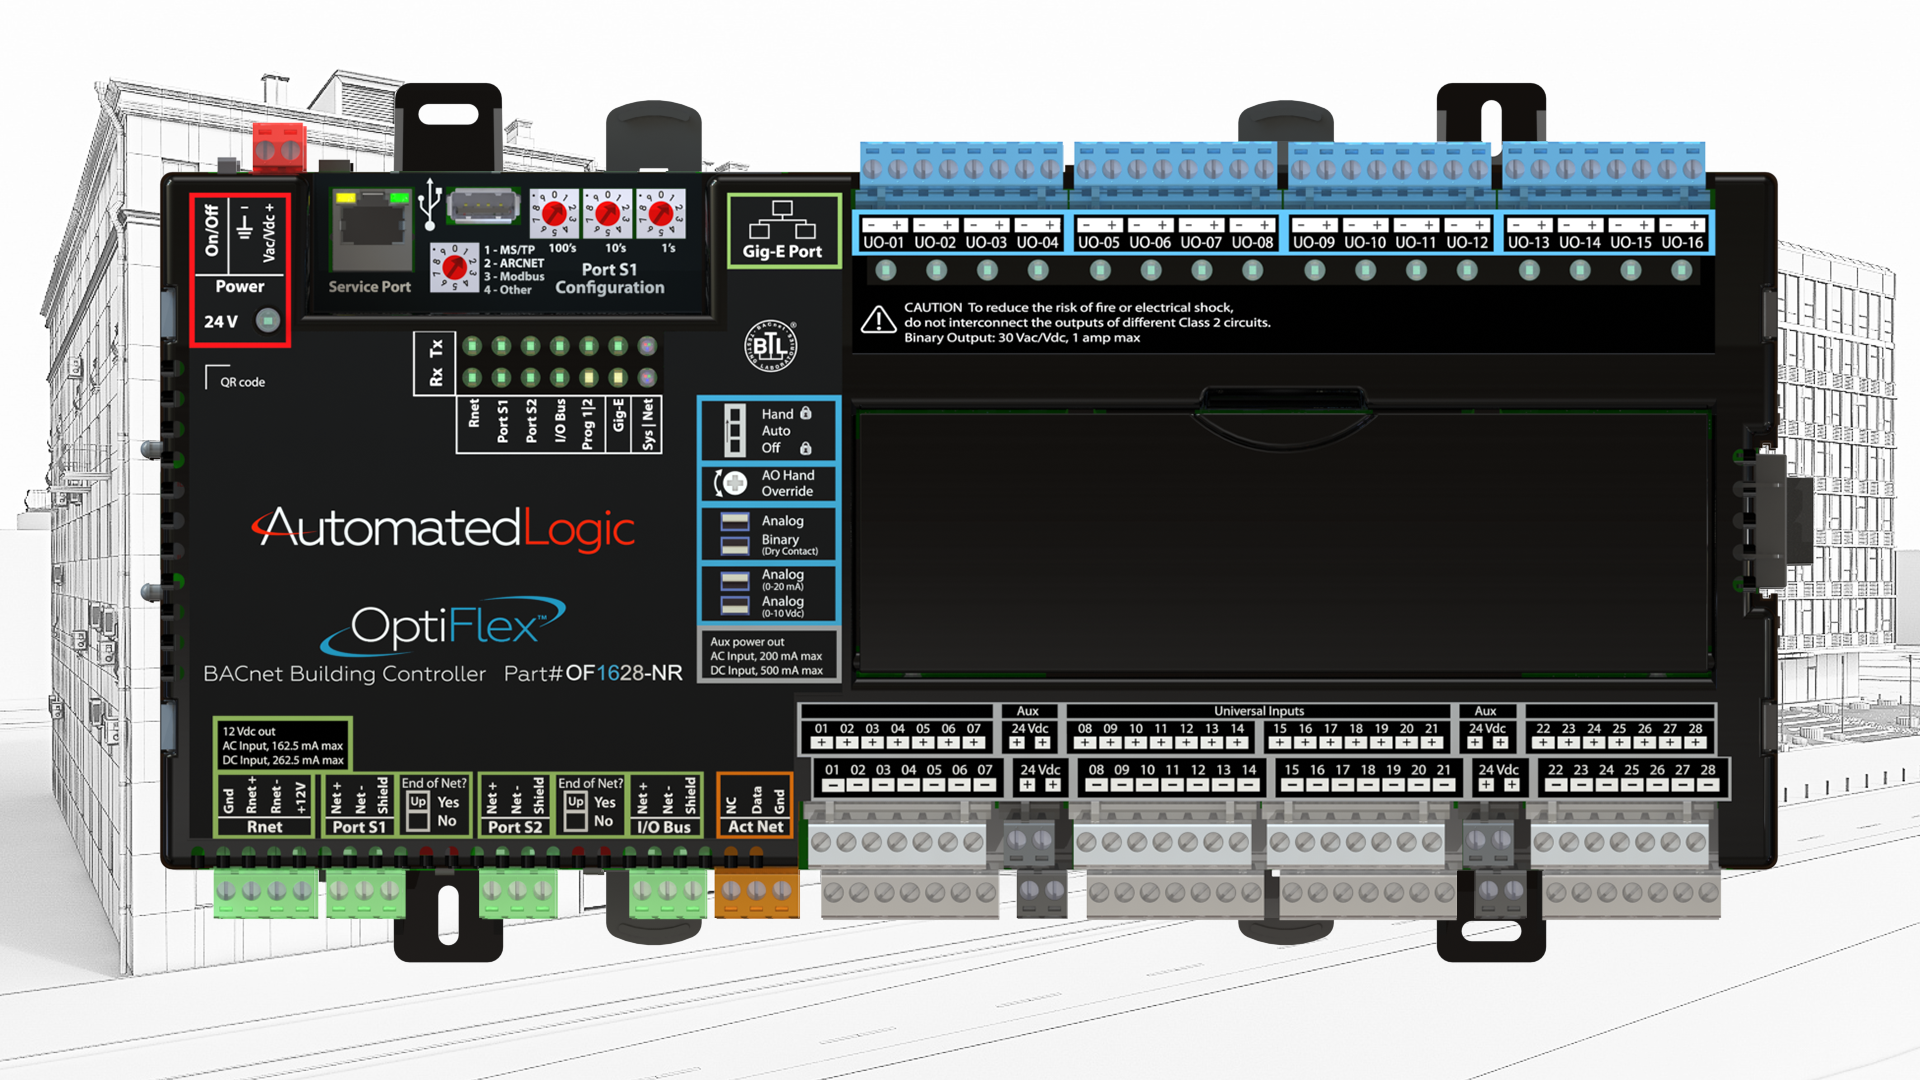 OptiFlex-BACnet-Building-Controller-OF1628-NR